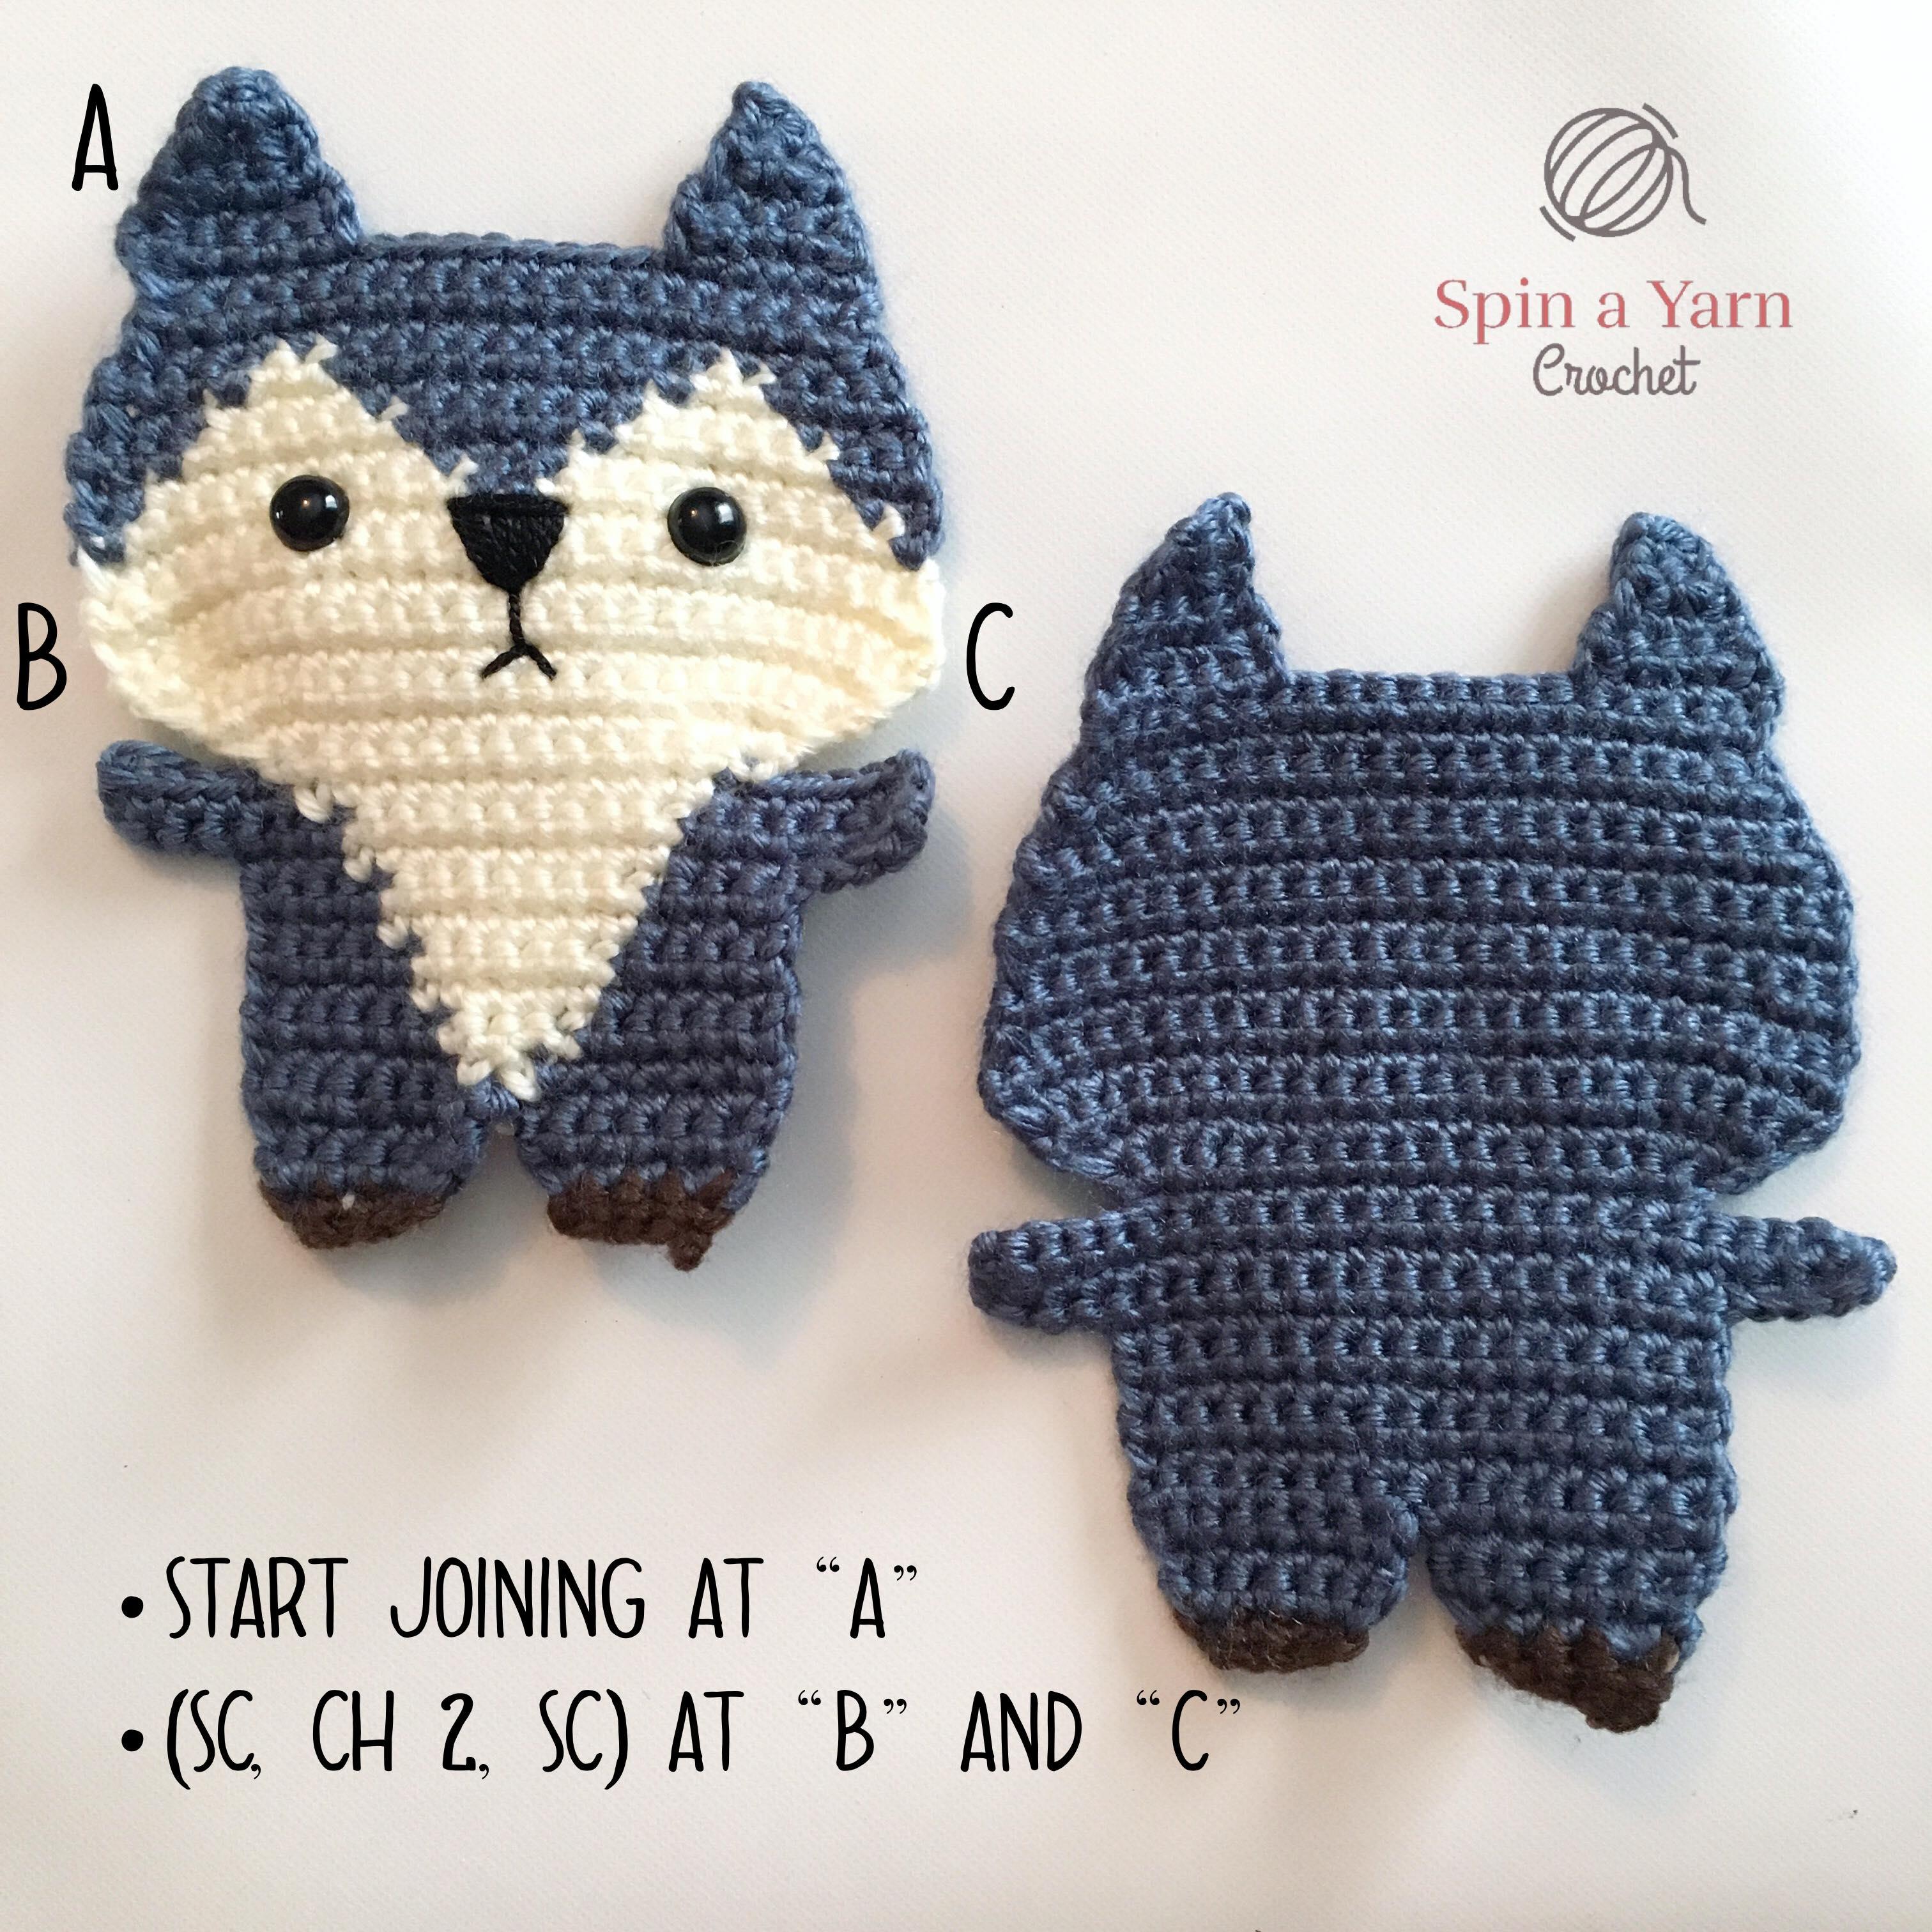 Amigurumi Crochet Fox Free Tutorials - Amigurumi - Amigurumim.com ... | 3024x3024